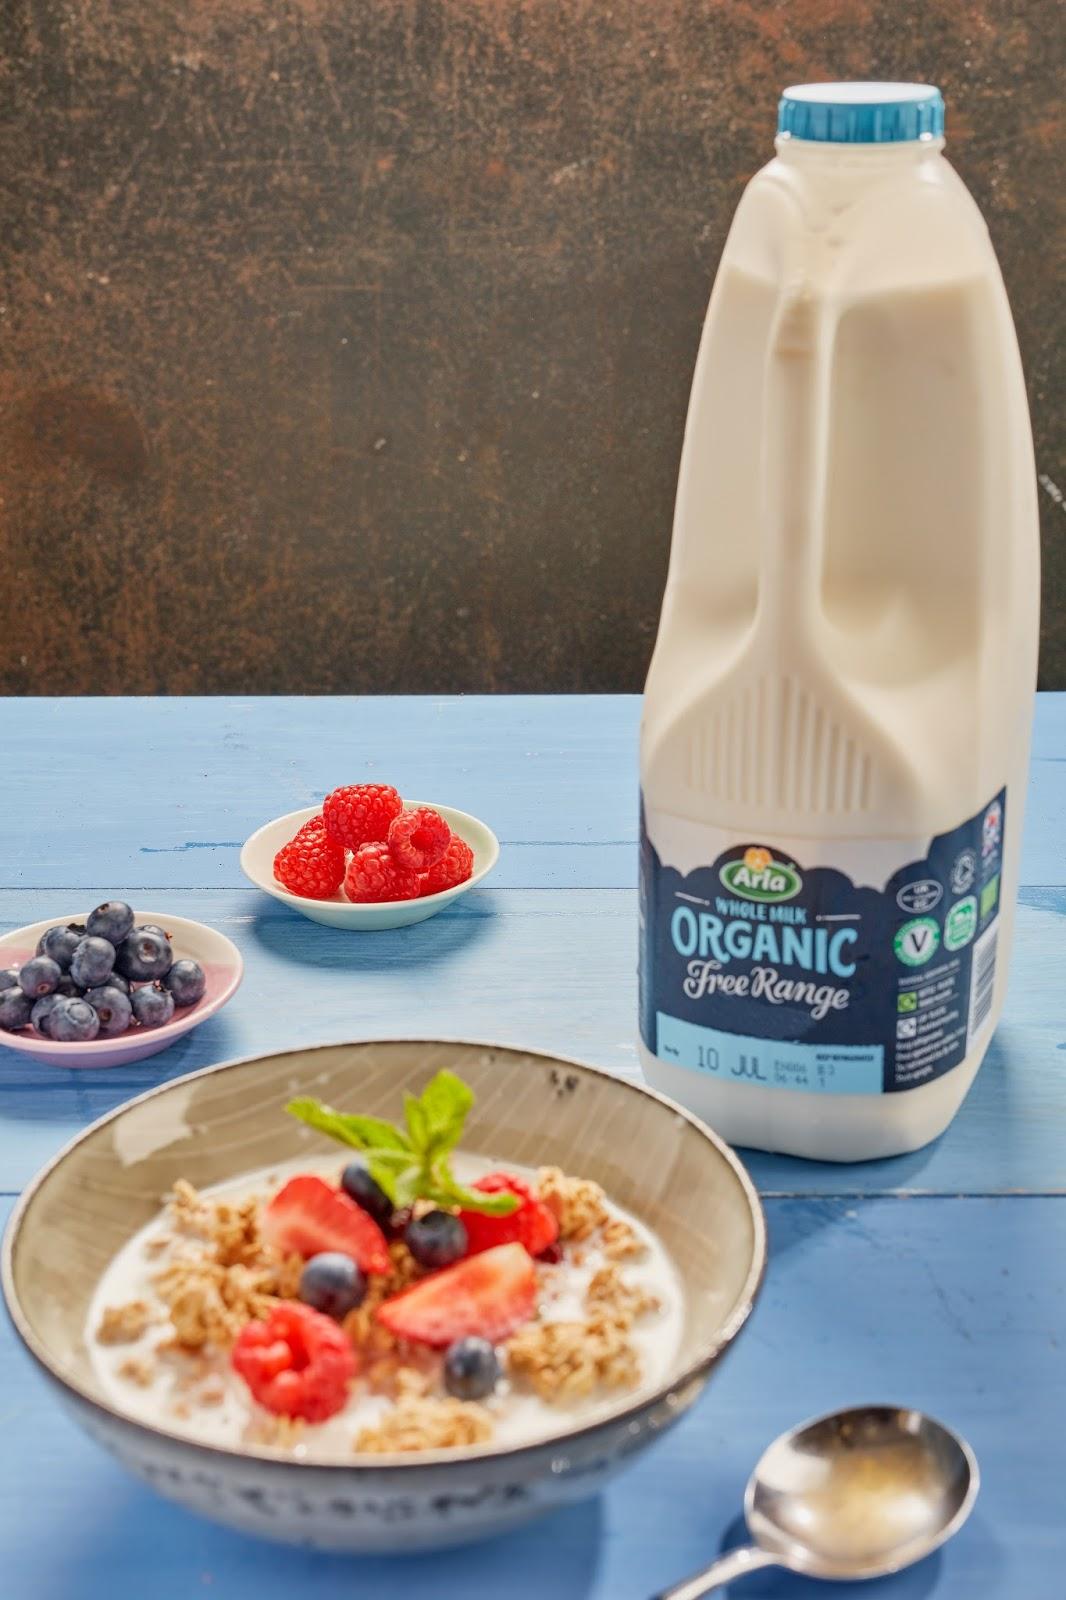 Arla Organic Free Range Milk & Cereal